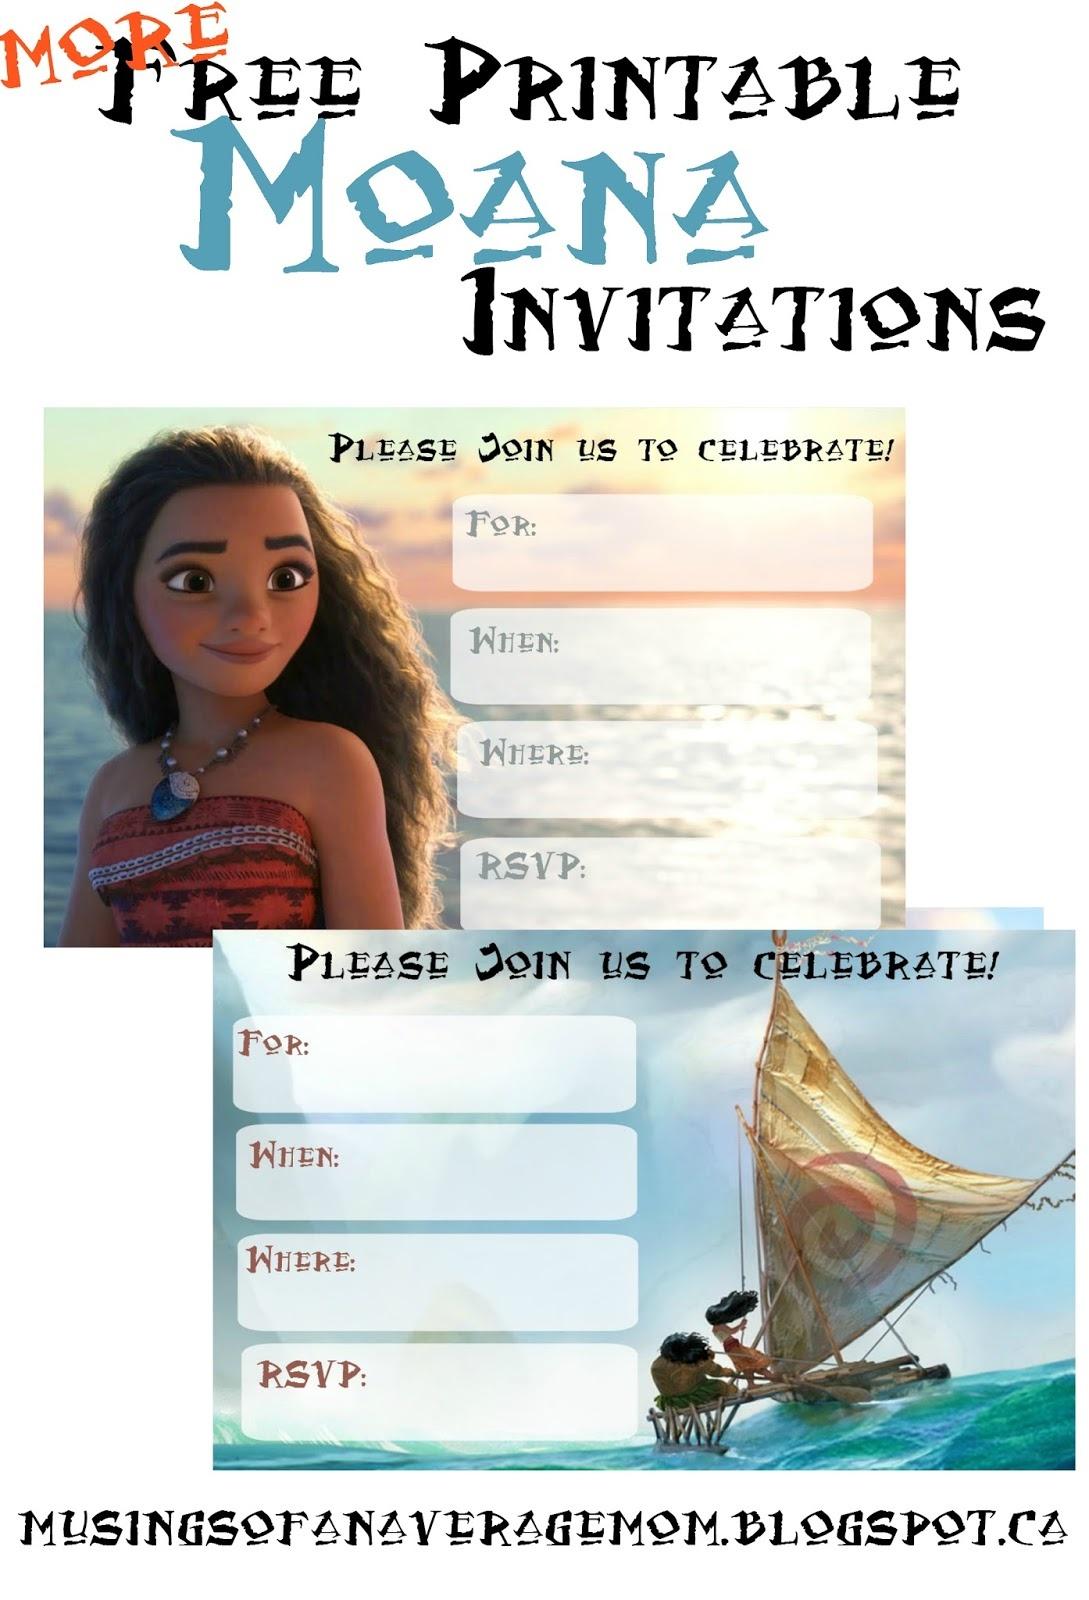 Musings Of An Average Mom: Free Printable Moana Invitations 2 - Free Moana Printable Invitations